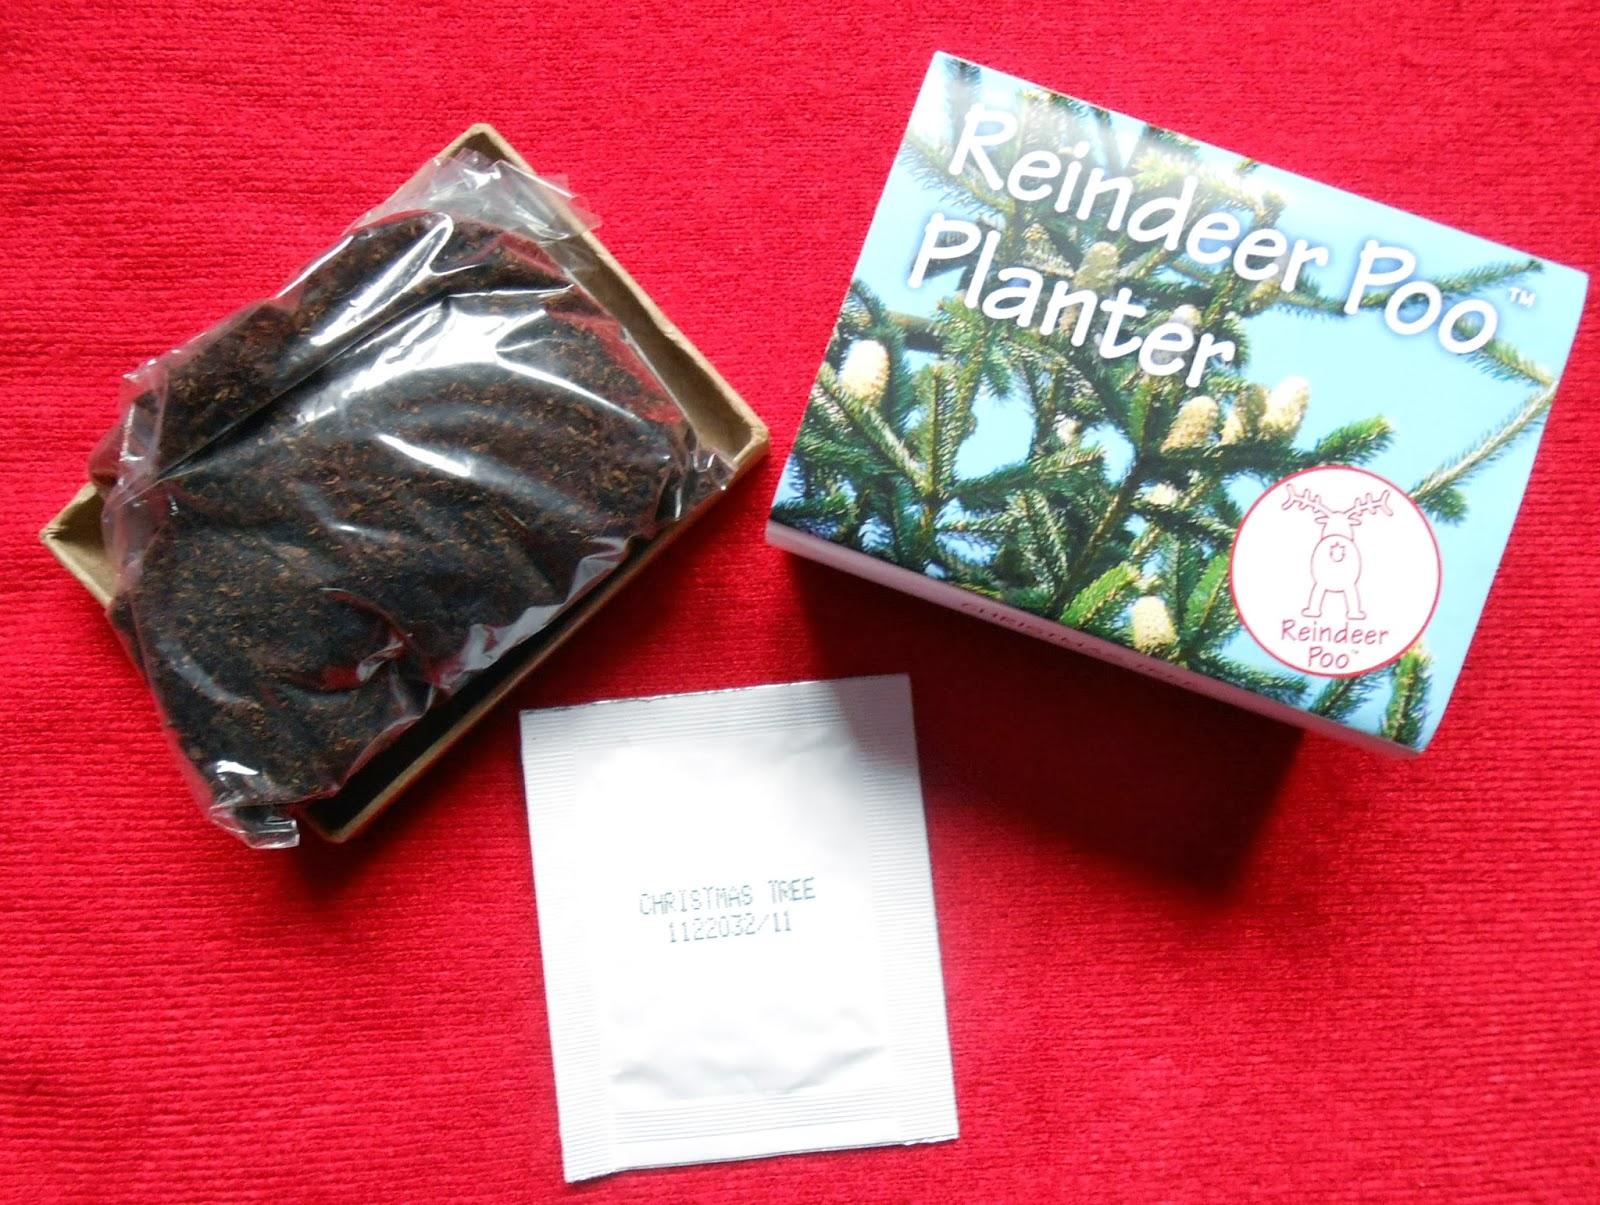 Reindeer Poo Planter